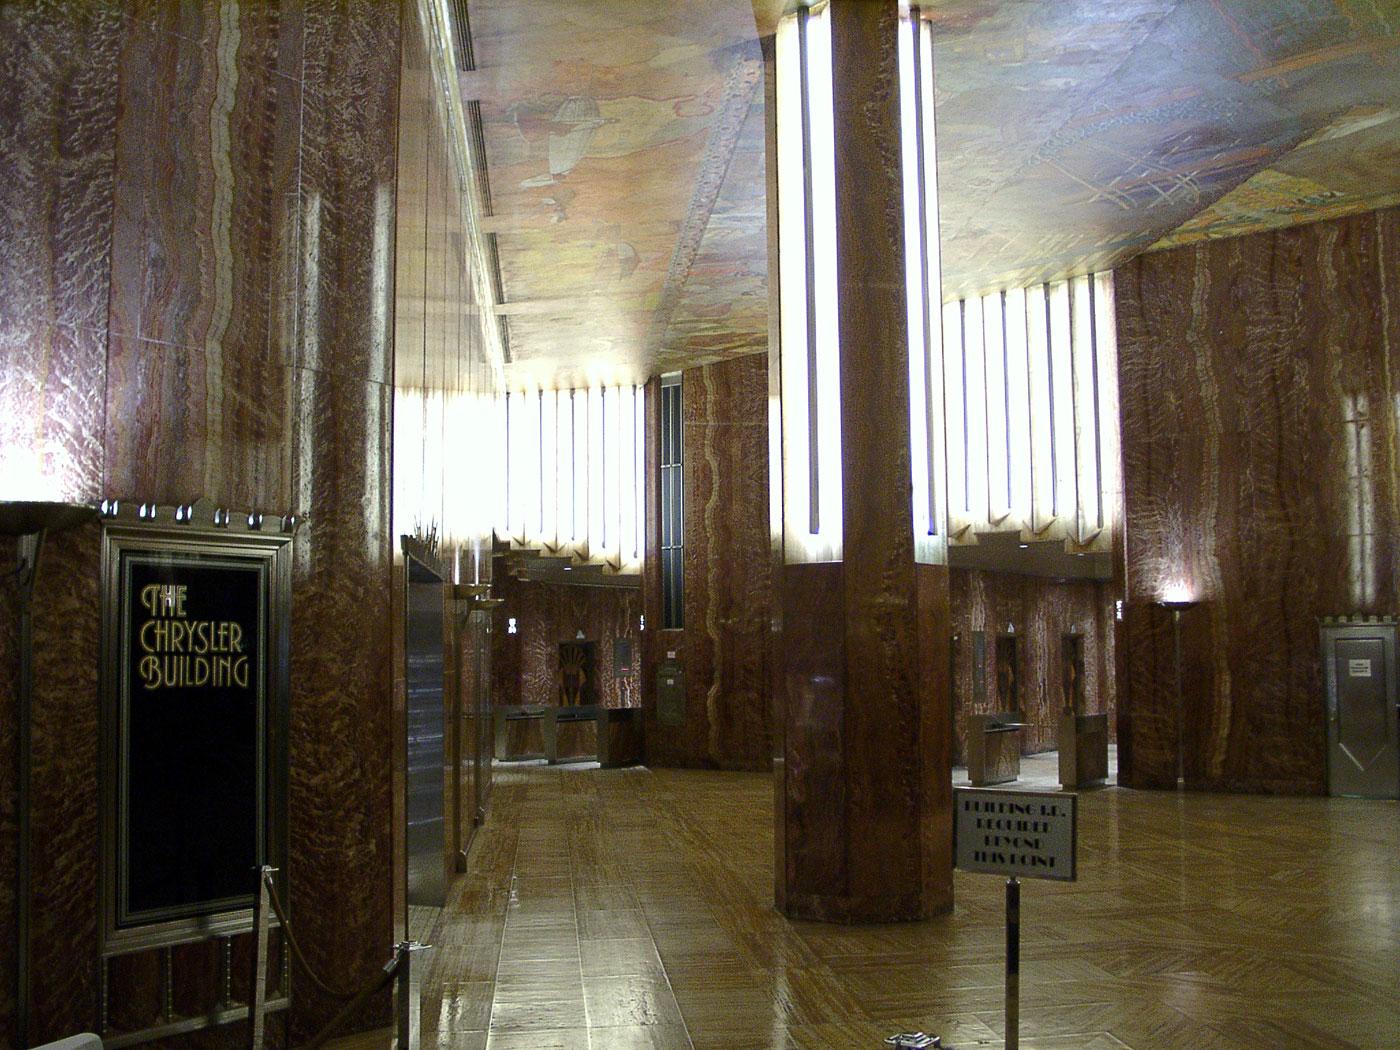 Chrysler Building Wikipedia: File:Chryslerbuilding Entranceha.jpg